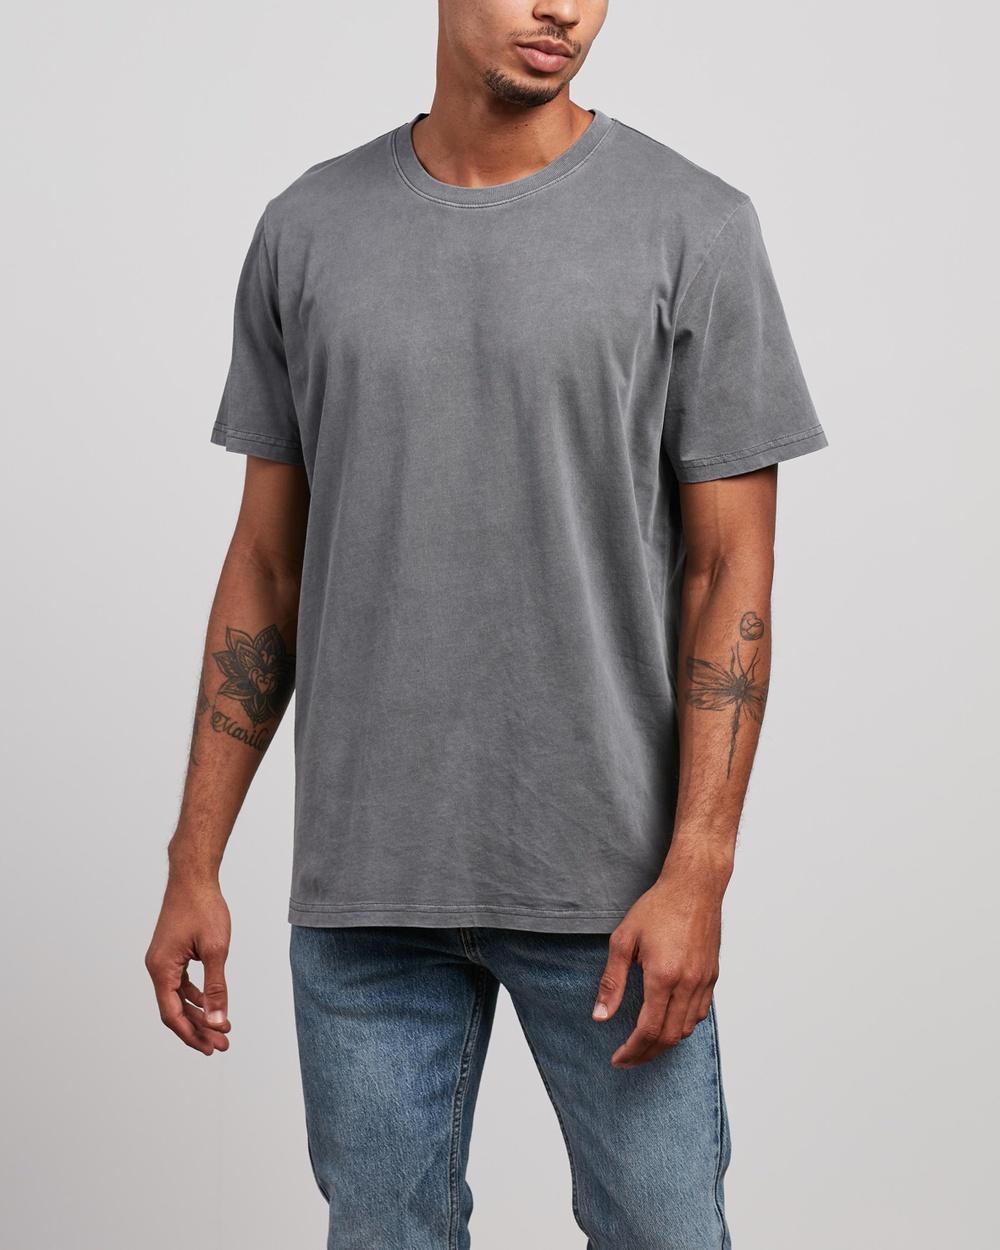 Neuw - Band Tee - T-Shirts & Singlets (Graphite Grey) Band Tee